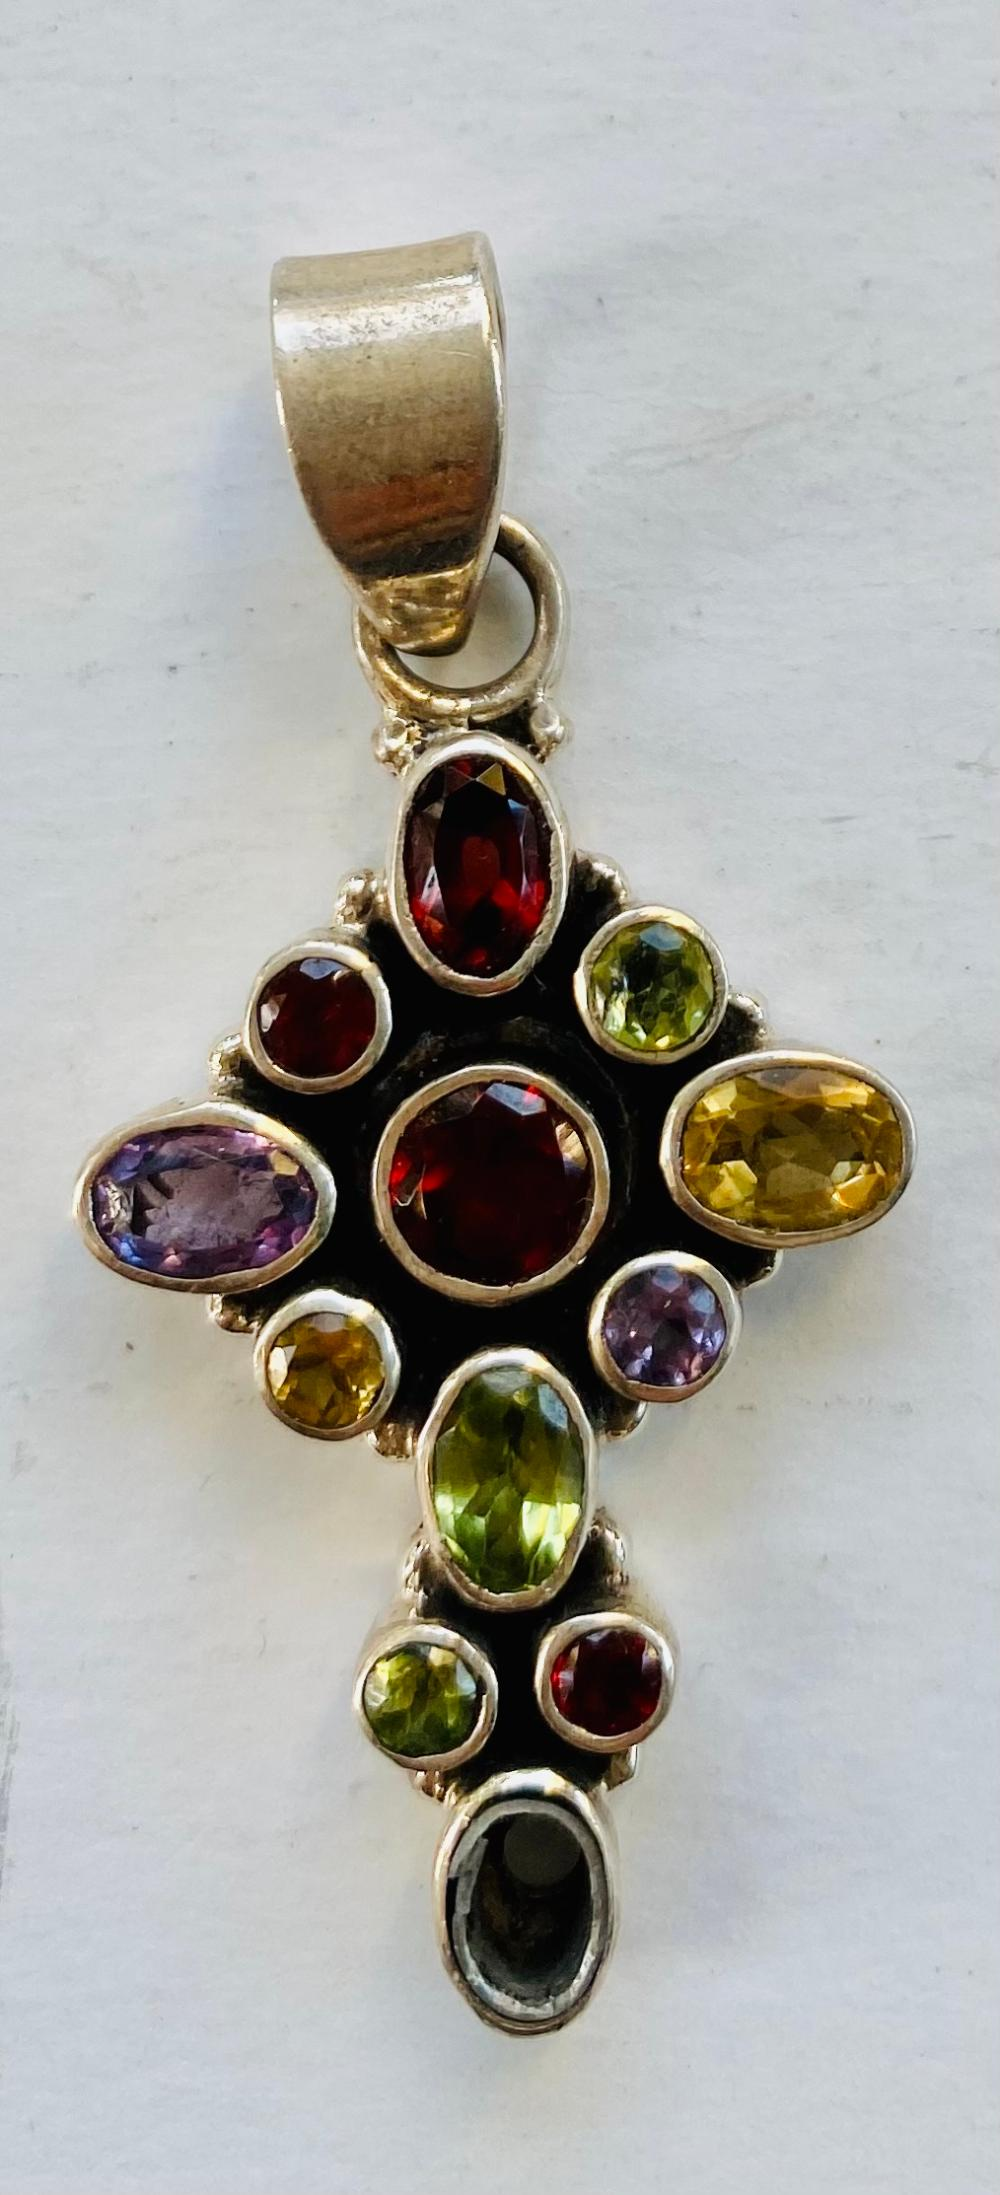 Gemstone sterling cross - 2 3/4 inches